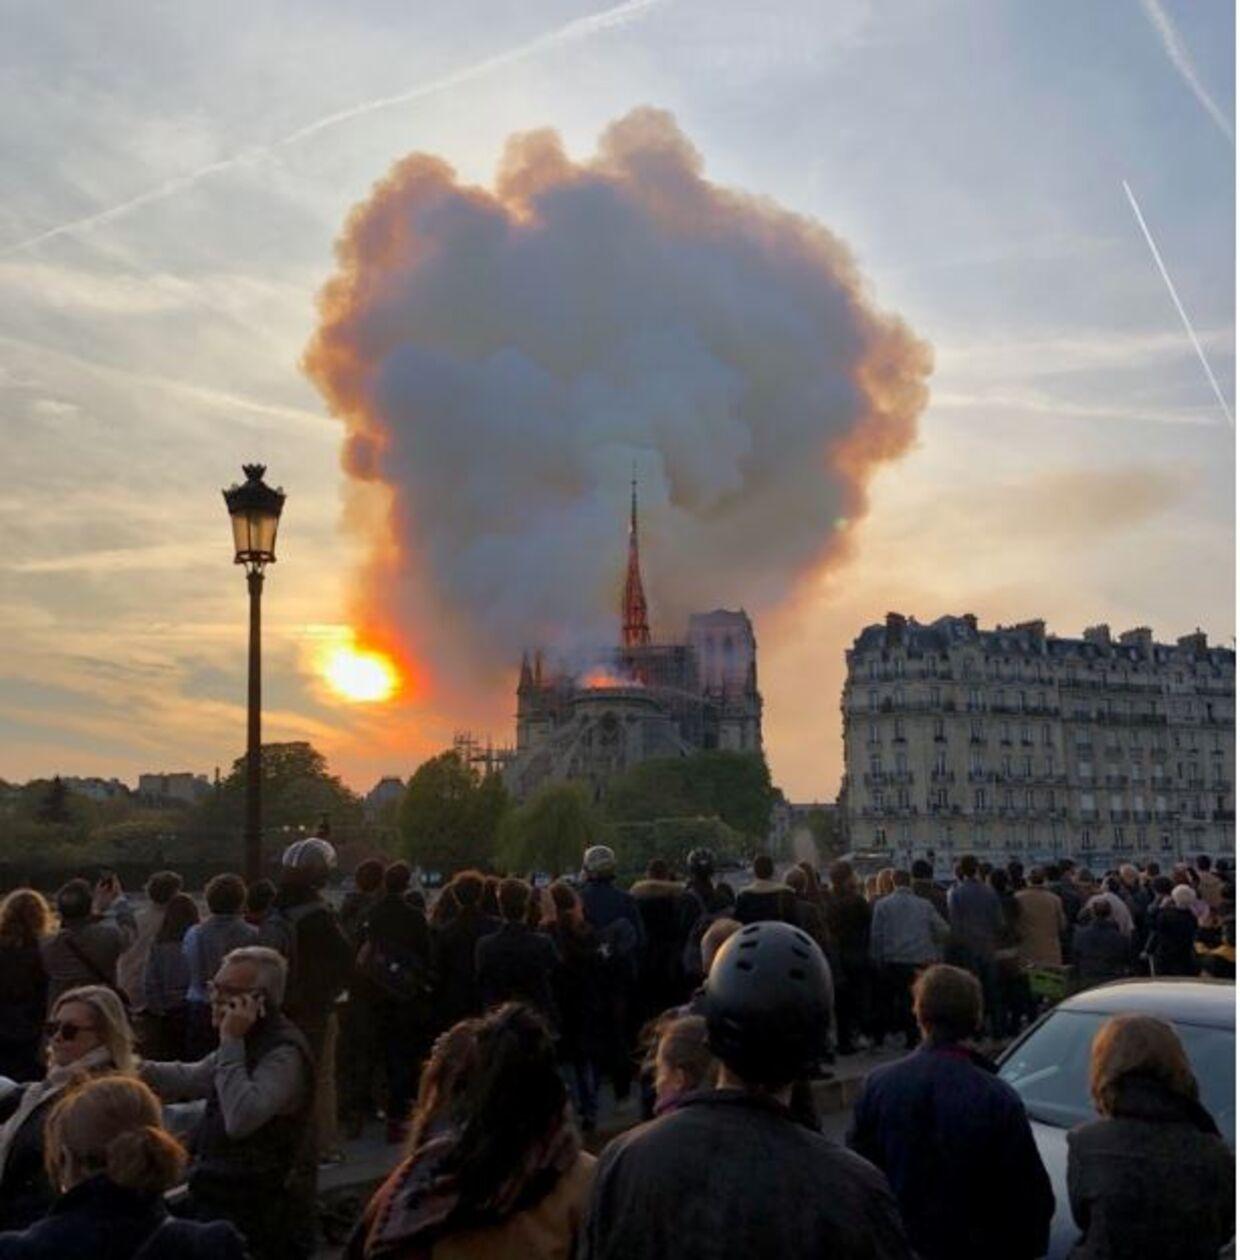 Da tårnet på billedet kollapsede, brød folk ud i gråd.